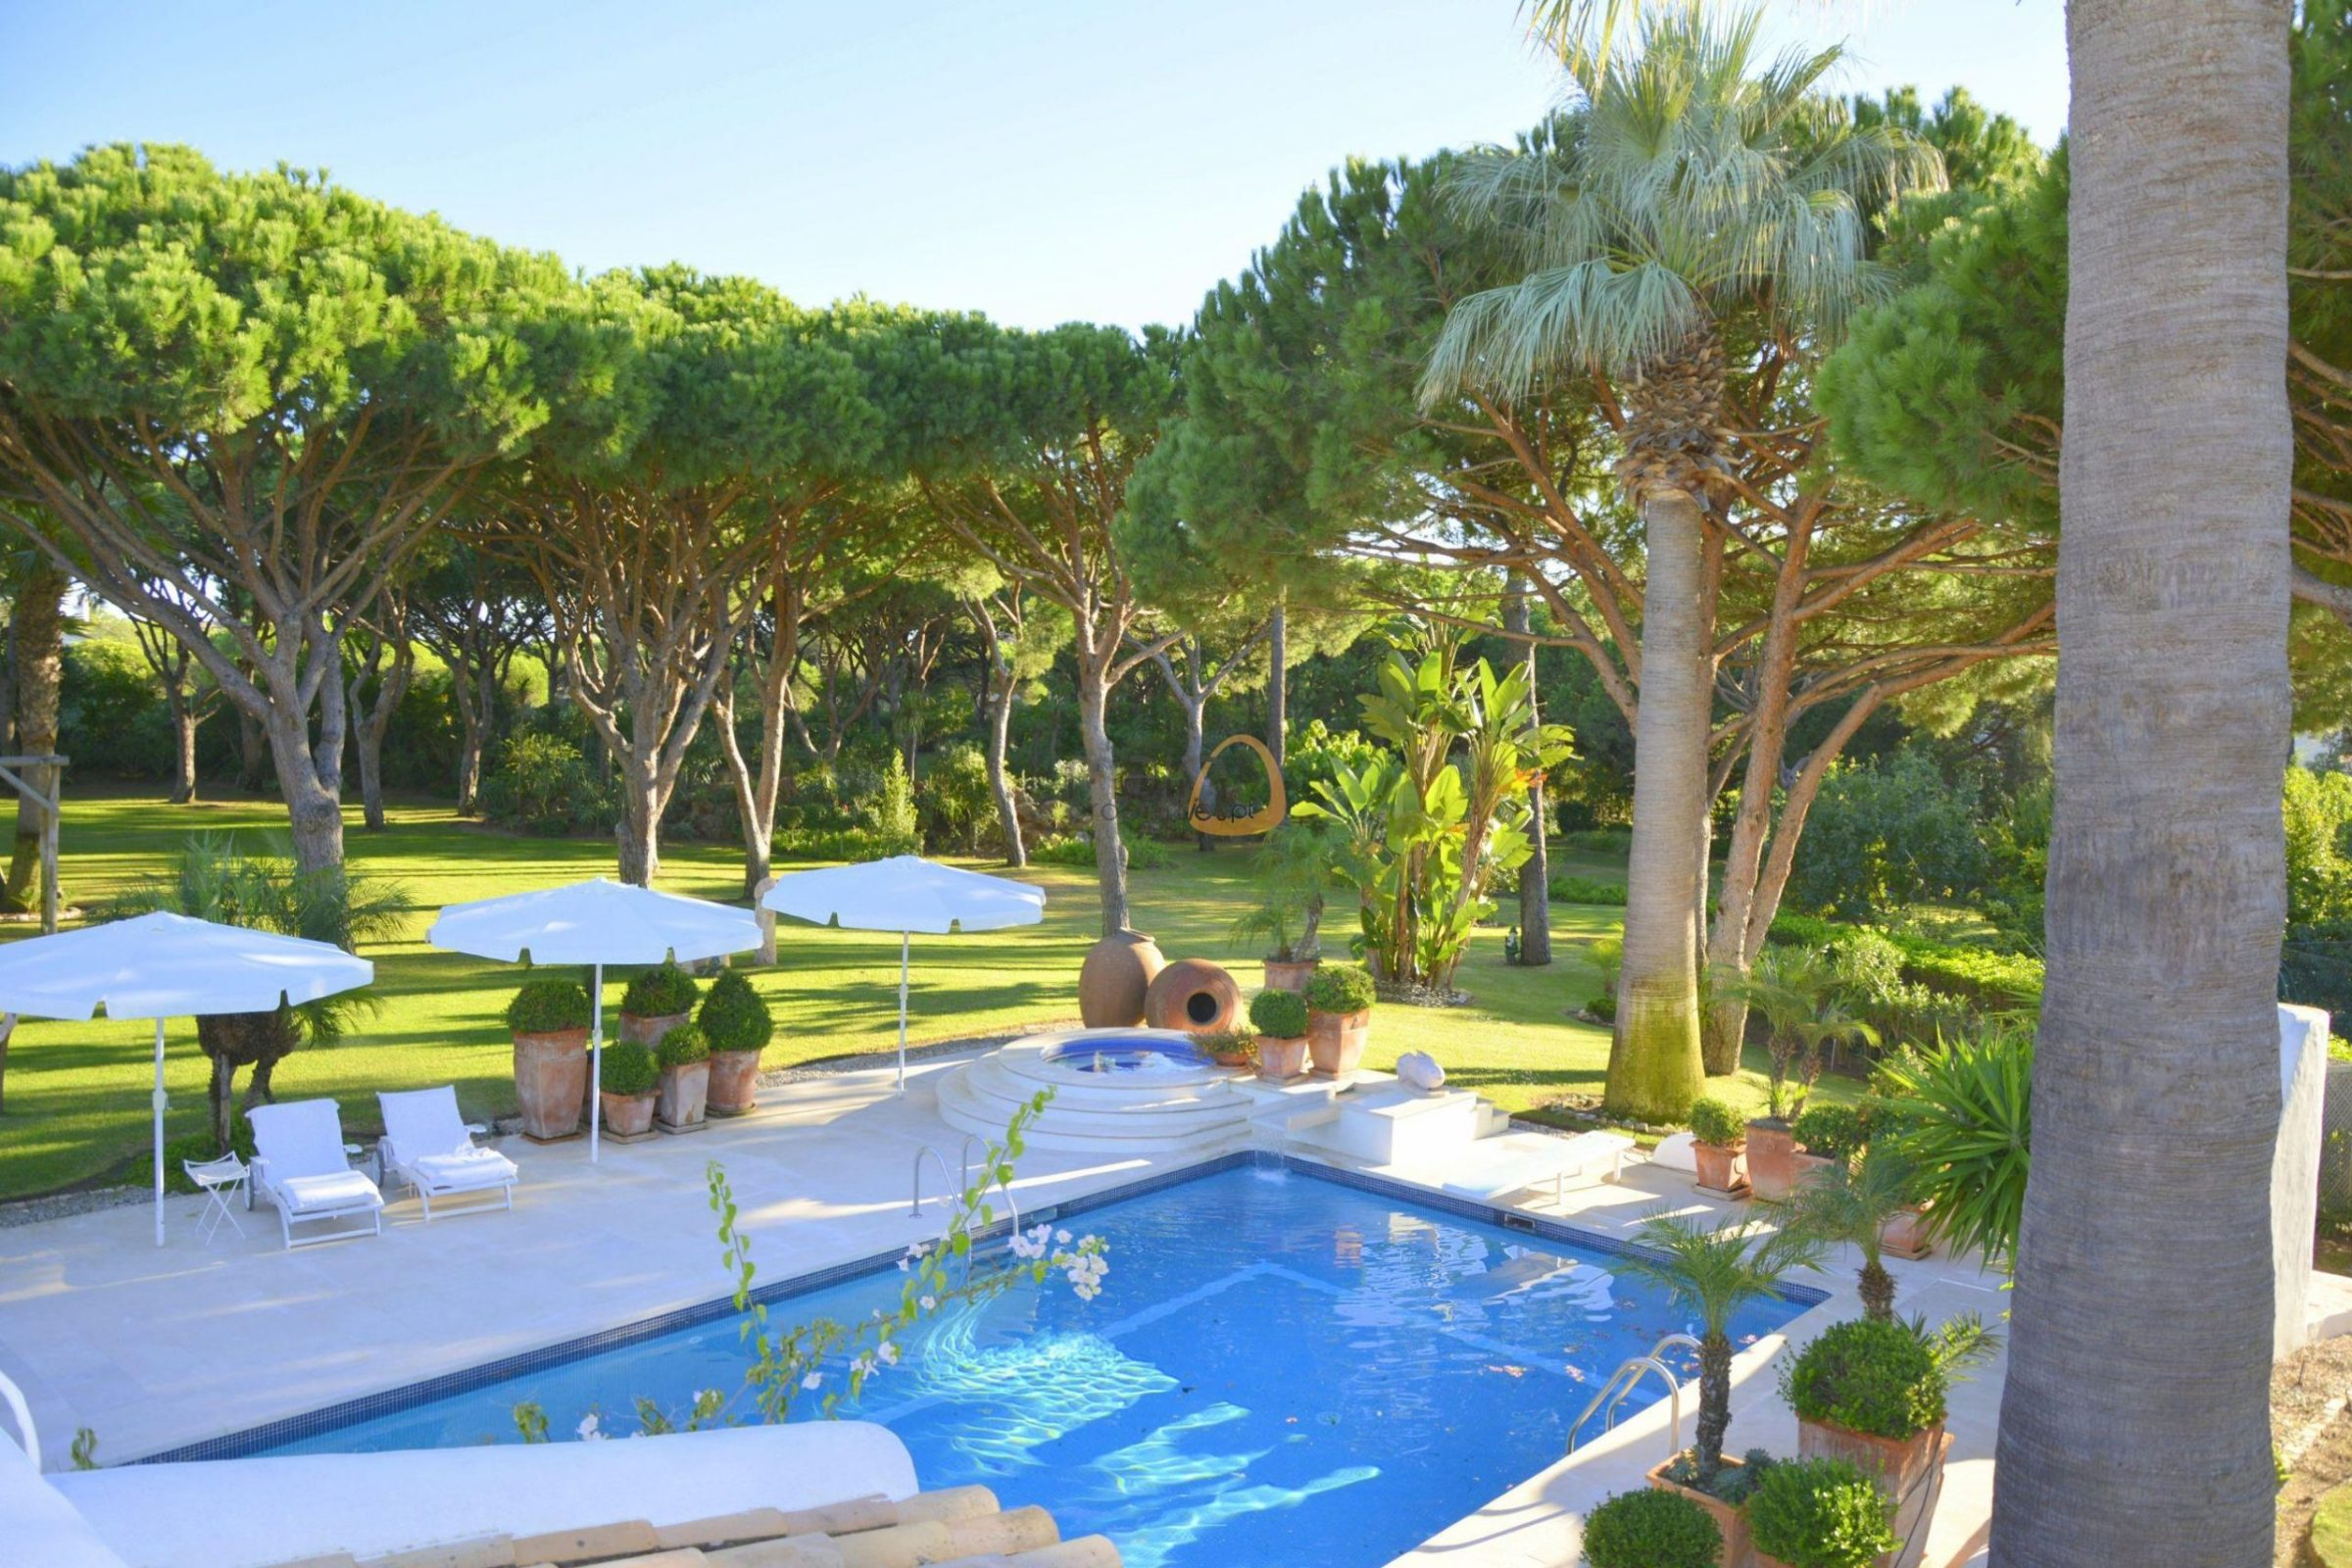 [:pt]Moradia com 5 quartos na Quinta do Lago :: Piscina 2 :: MainProperties :: 020061[:en]5 bedroom villa  in Quinta do Lago :: Pool 1 :: MainProperties :: 020061[:]